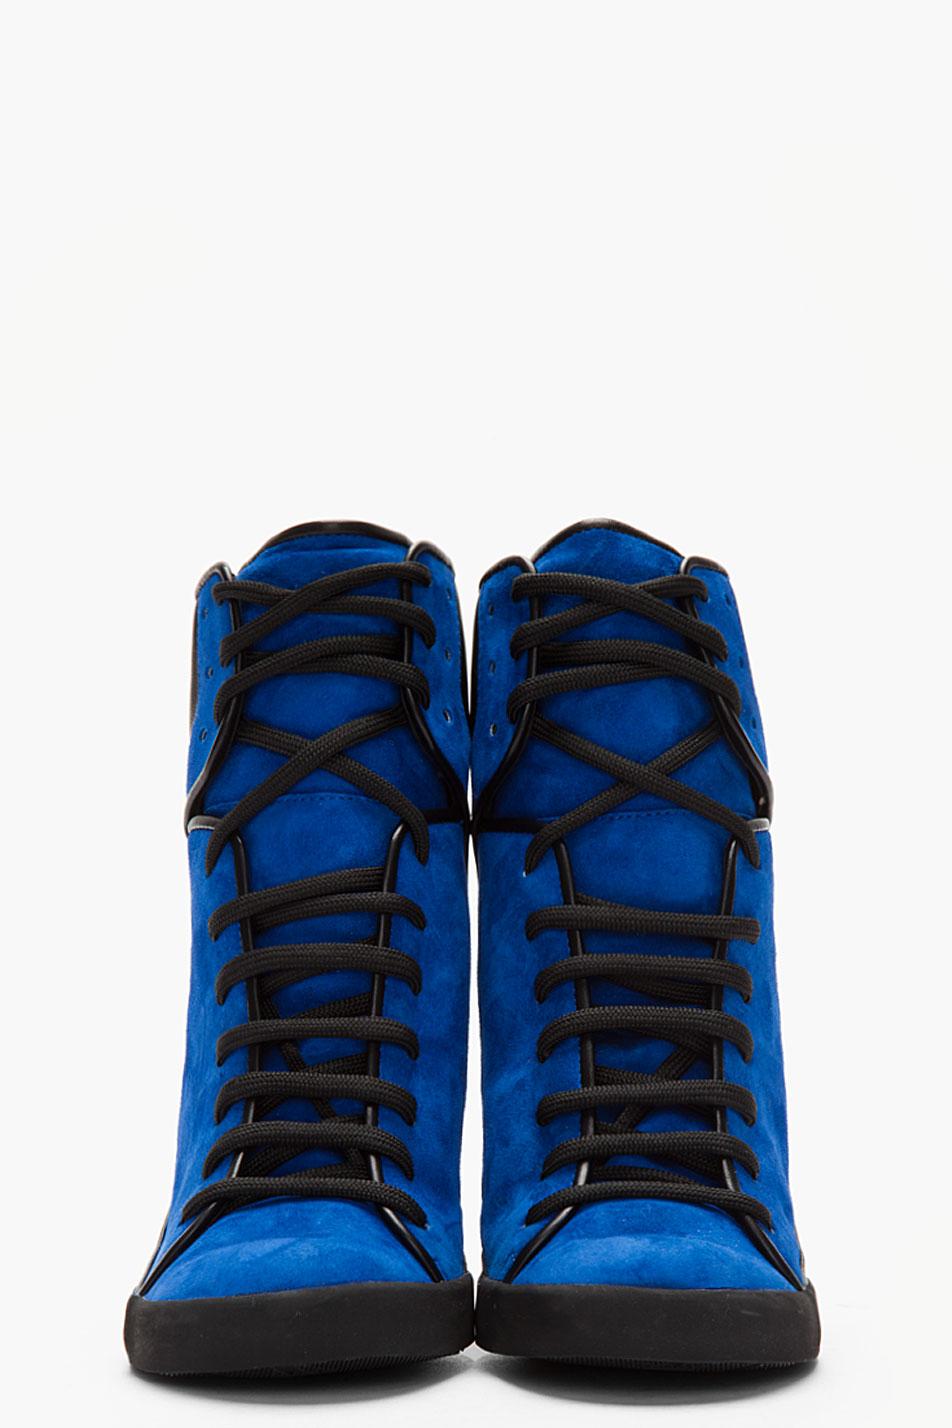 Lyst See By Chlo 233 Suede Sam Sneaker Wedges In Blue